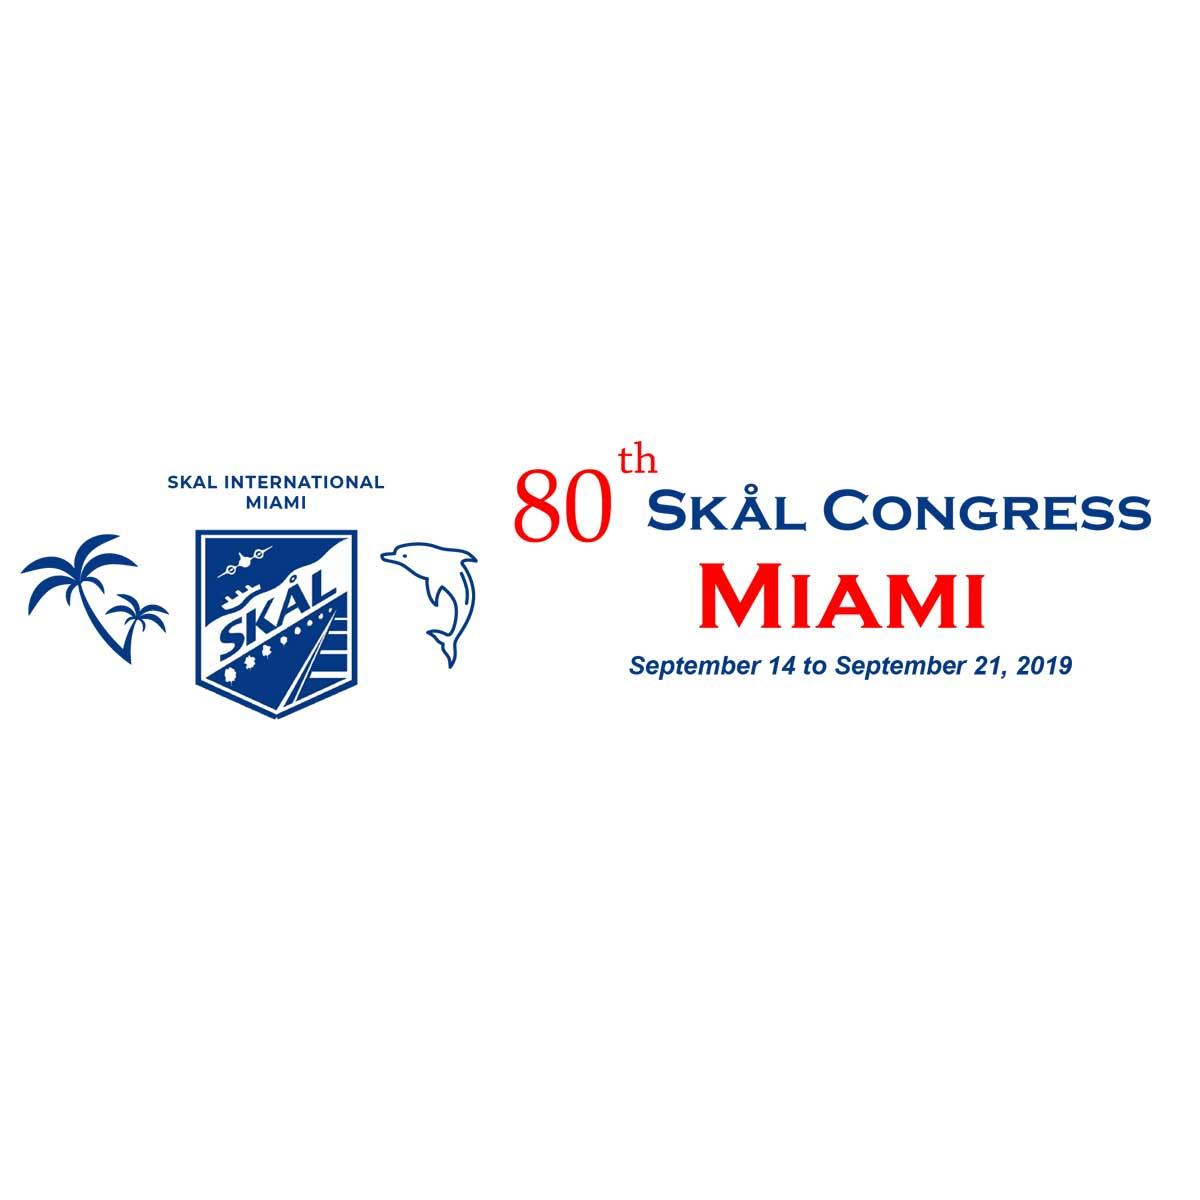 80th-skal-congress